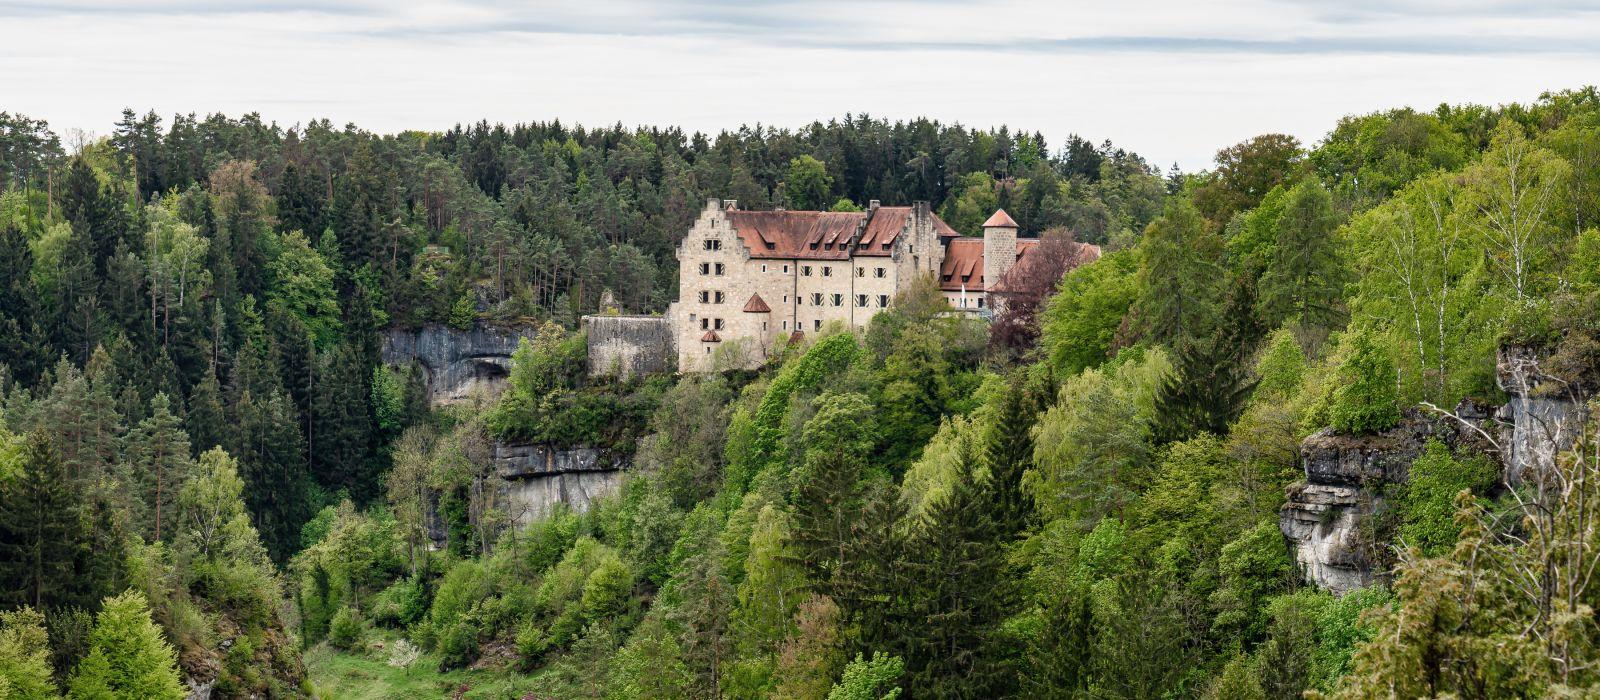 Rabenstein castle in Fraconian Switzerland in Bavaria, Germany, Europe